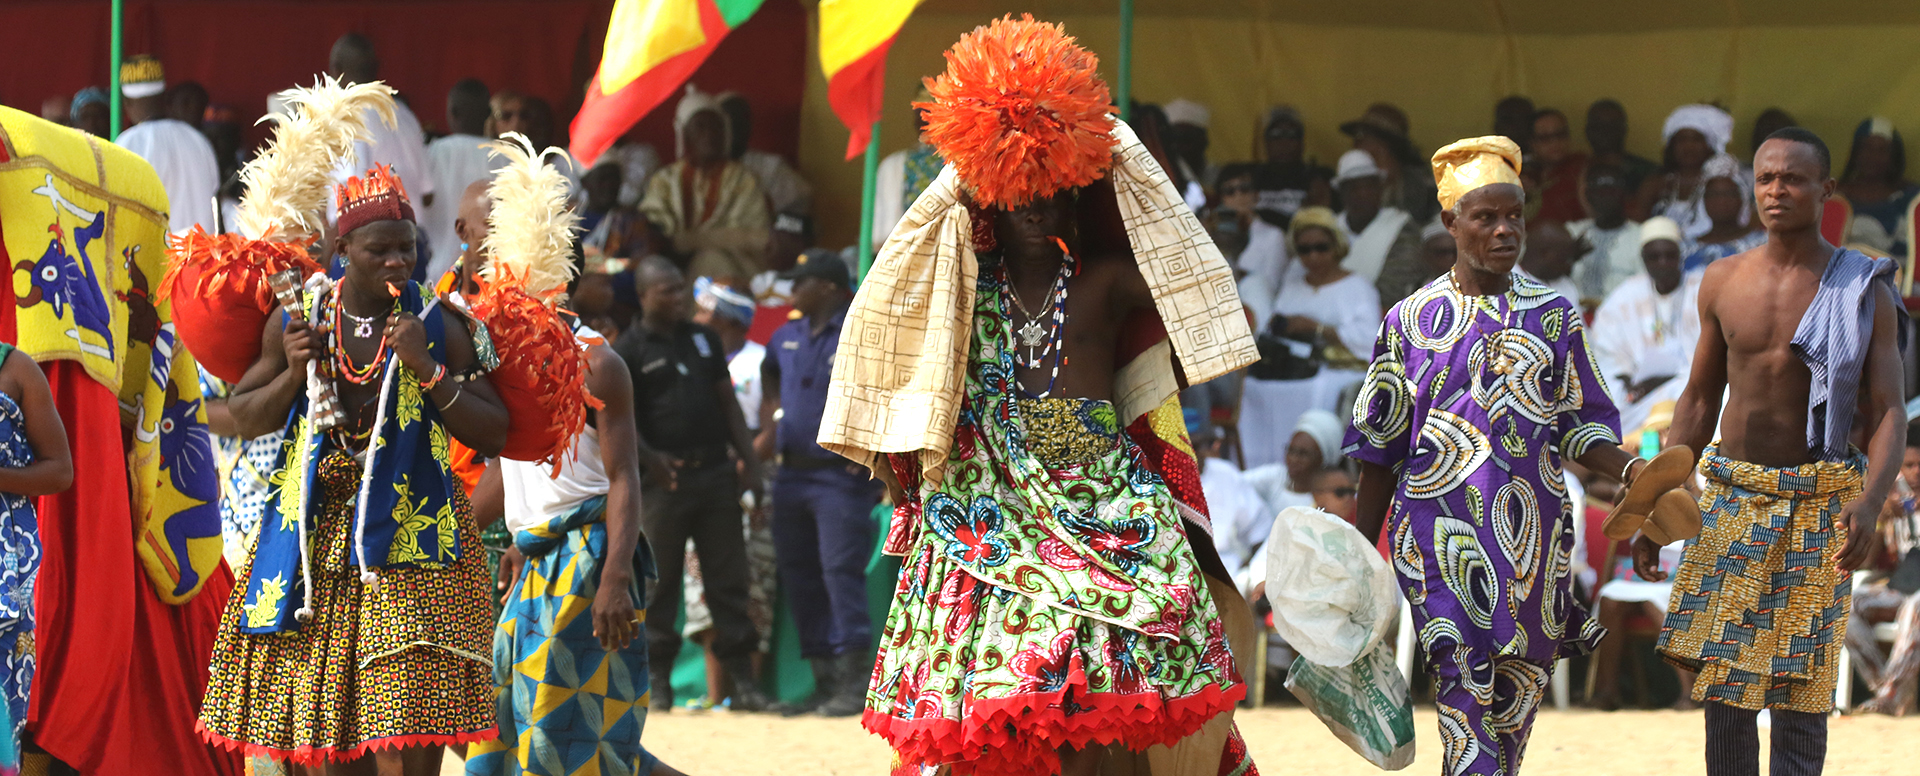 The Ouidah Voodoo festival in Benin | Exploring Africa